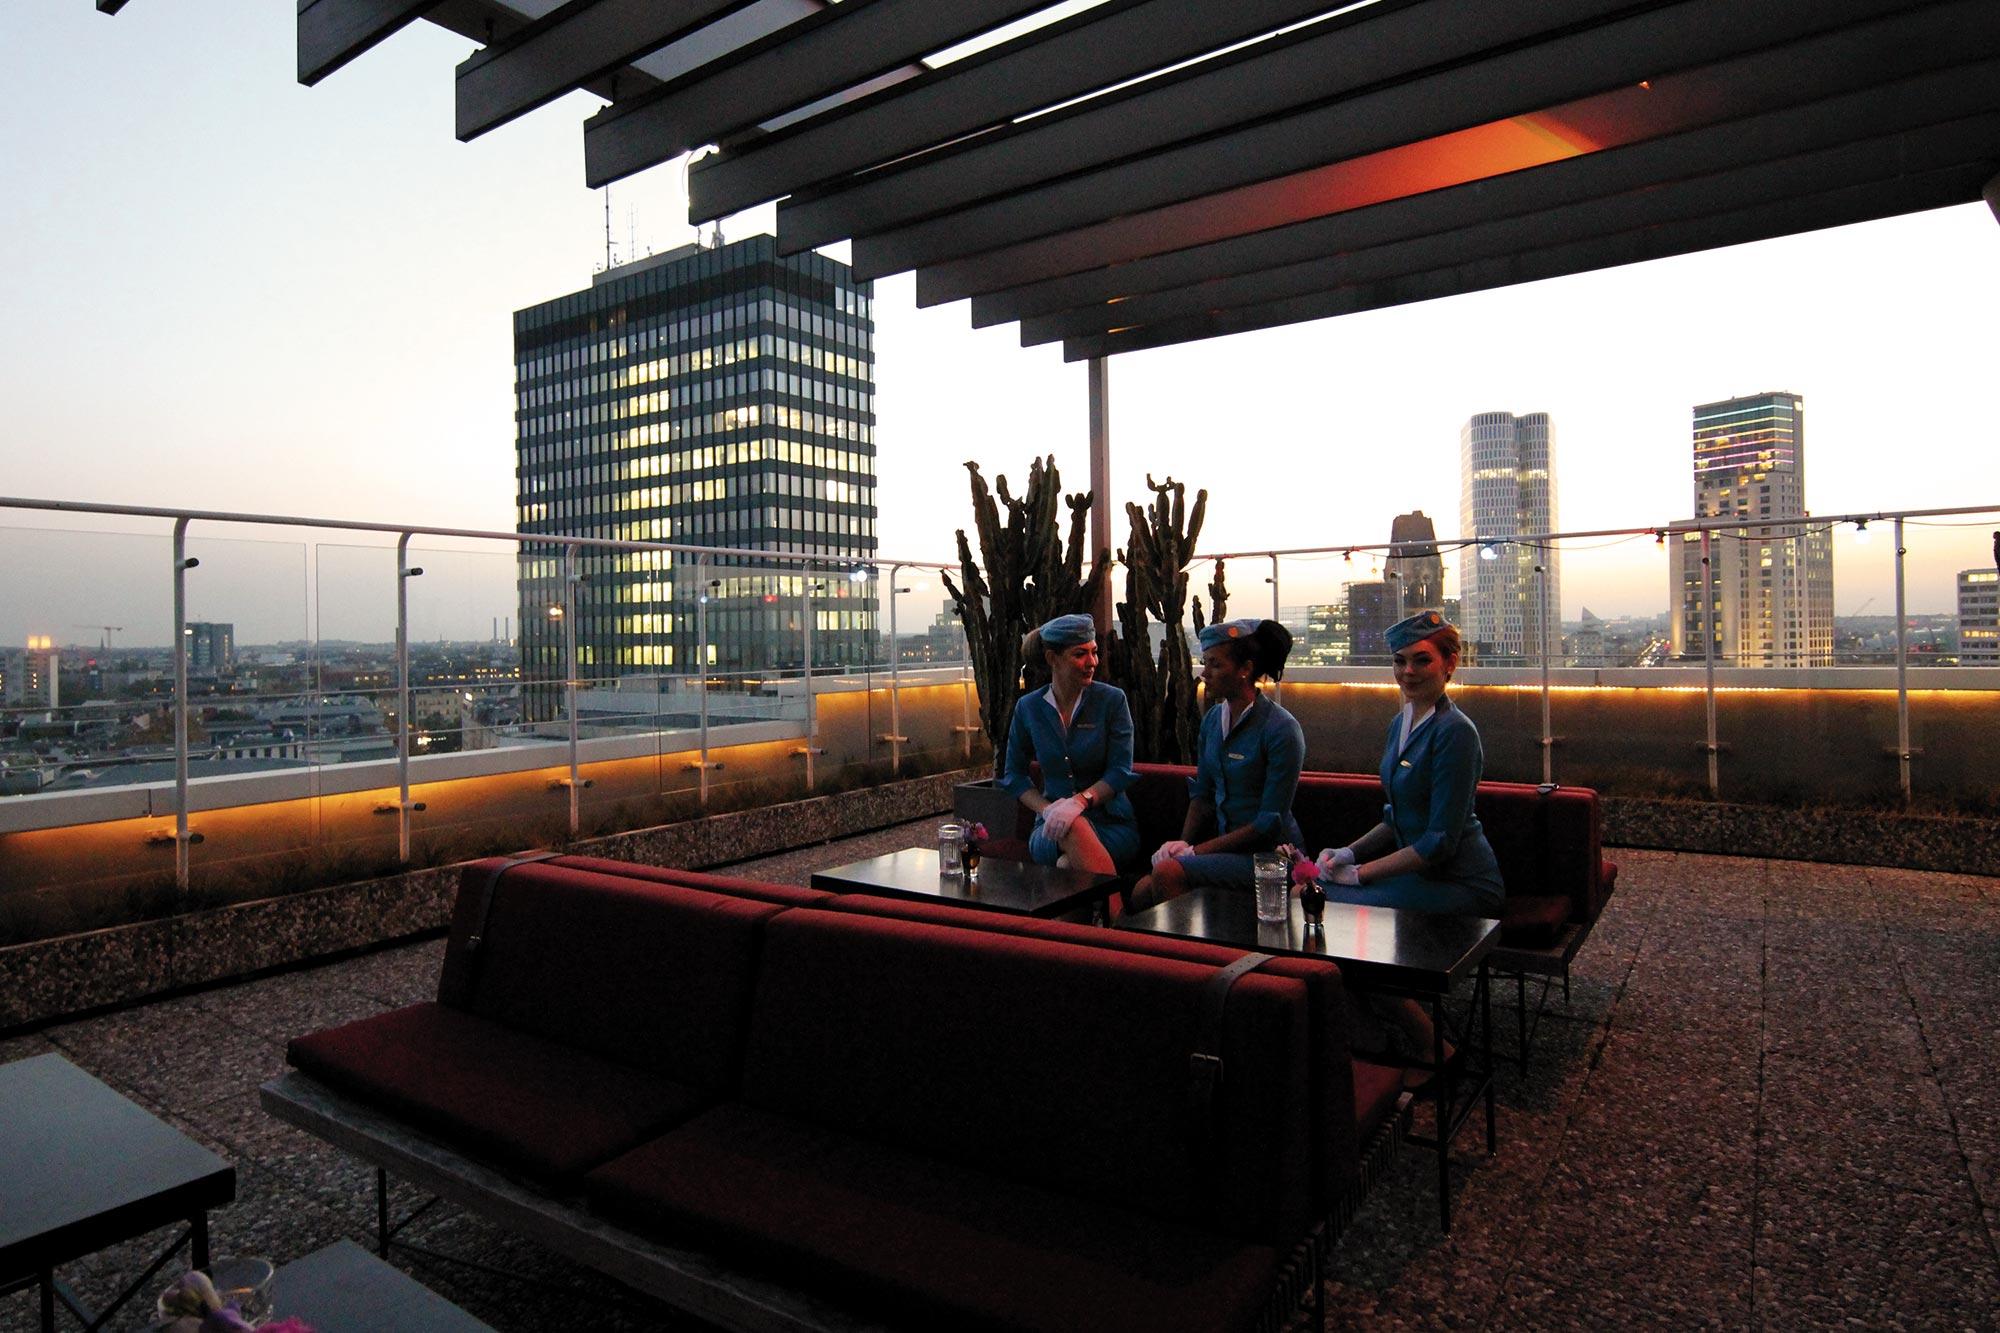 Full Size of Terrassen Lounge Pan Am Berlin Rooftop Terrasse Loungemöbel Garten Holz Set Möbel Günstig Sessel Sofa Wohnzimmer Terrassen Lounge